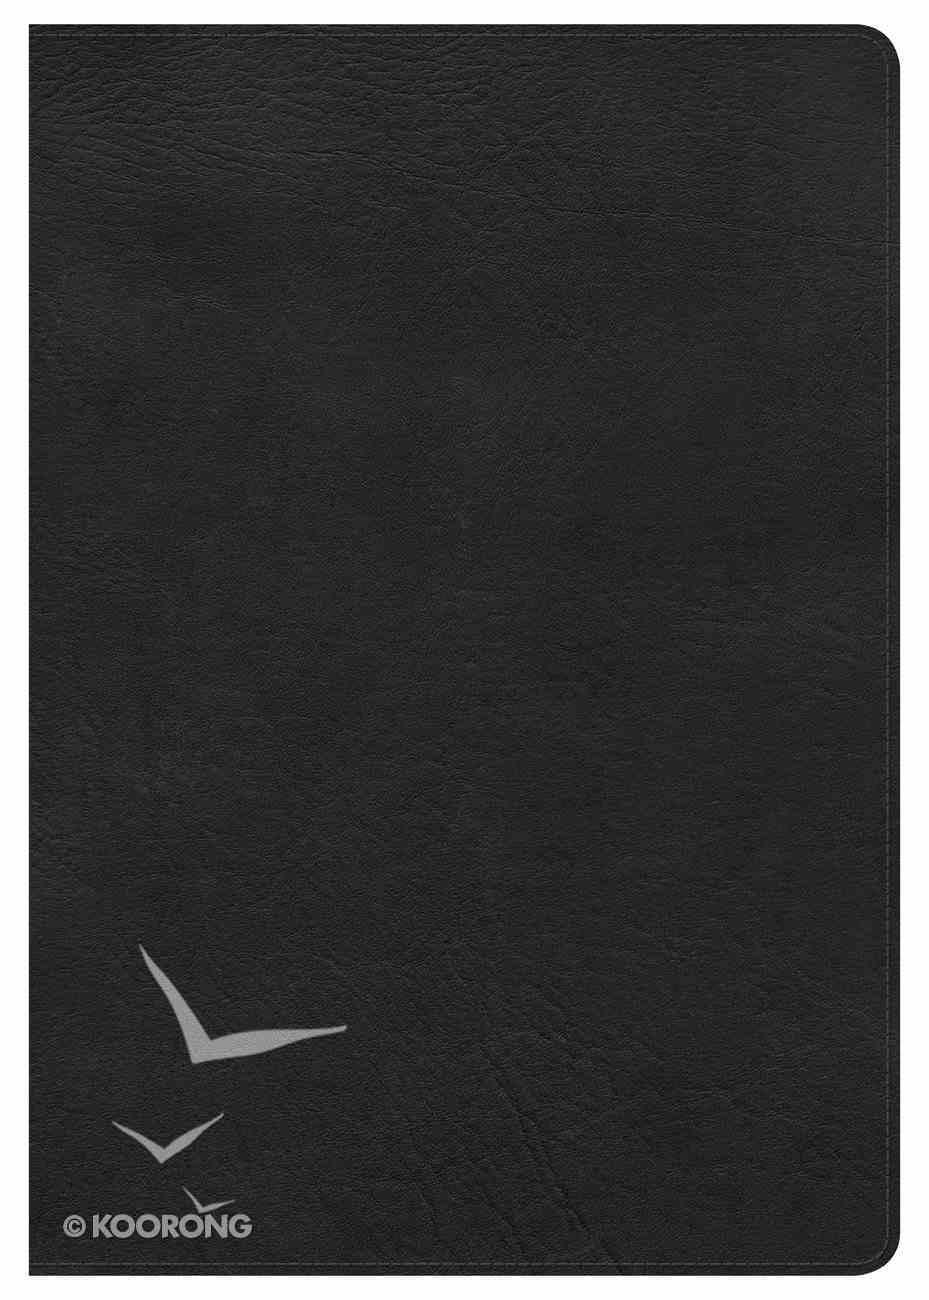 KJV Super Giant Print Reference Indexed Bible Black Imitation Leather